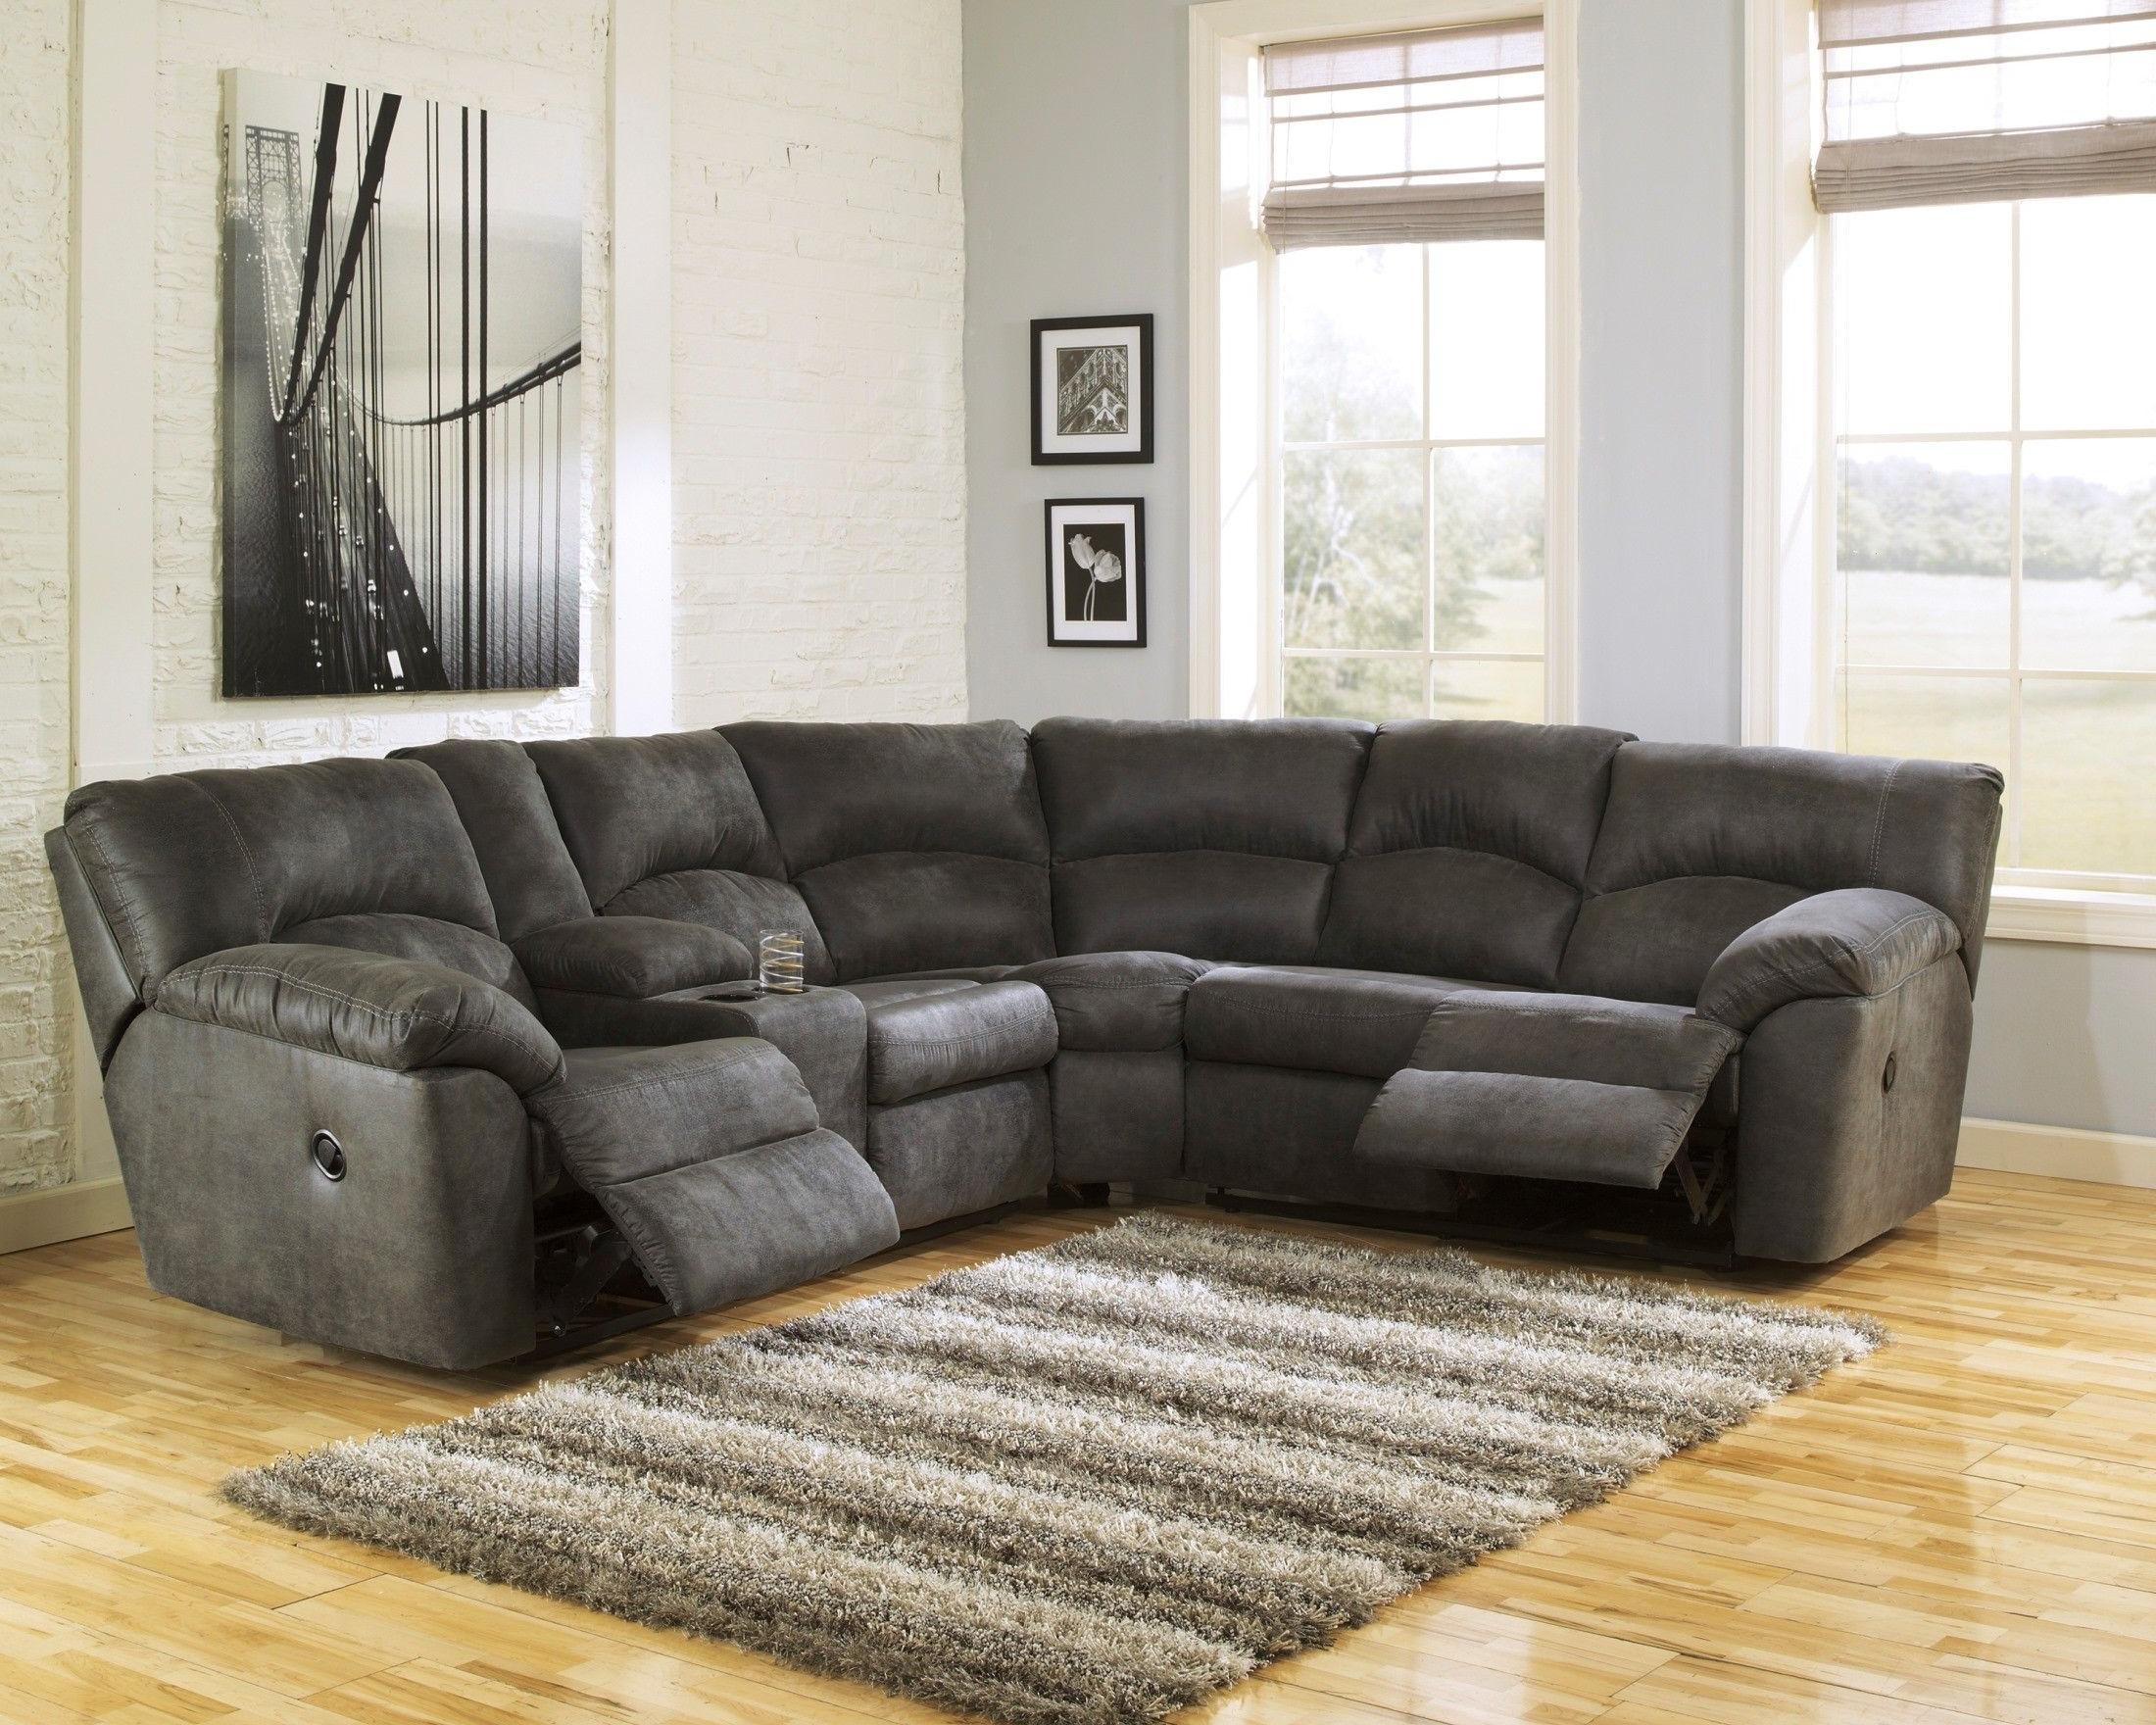 Tambo Pewter, Asl 27801 48 49, Ashley Furniture (View 4 of 20)